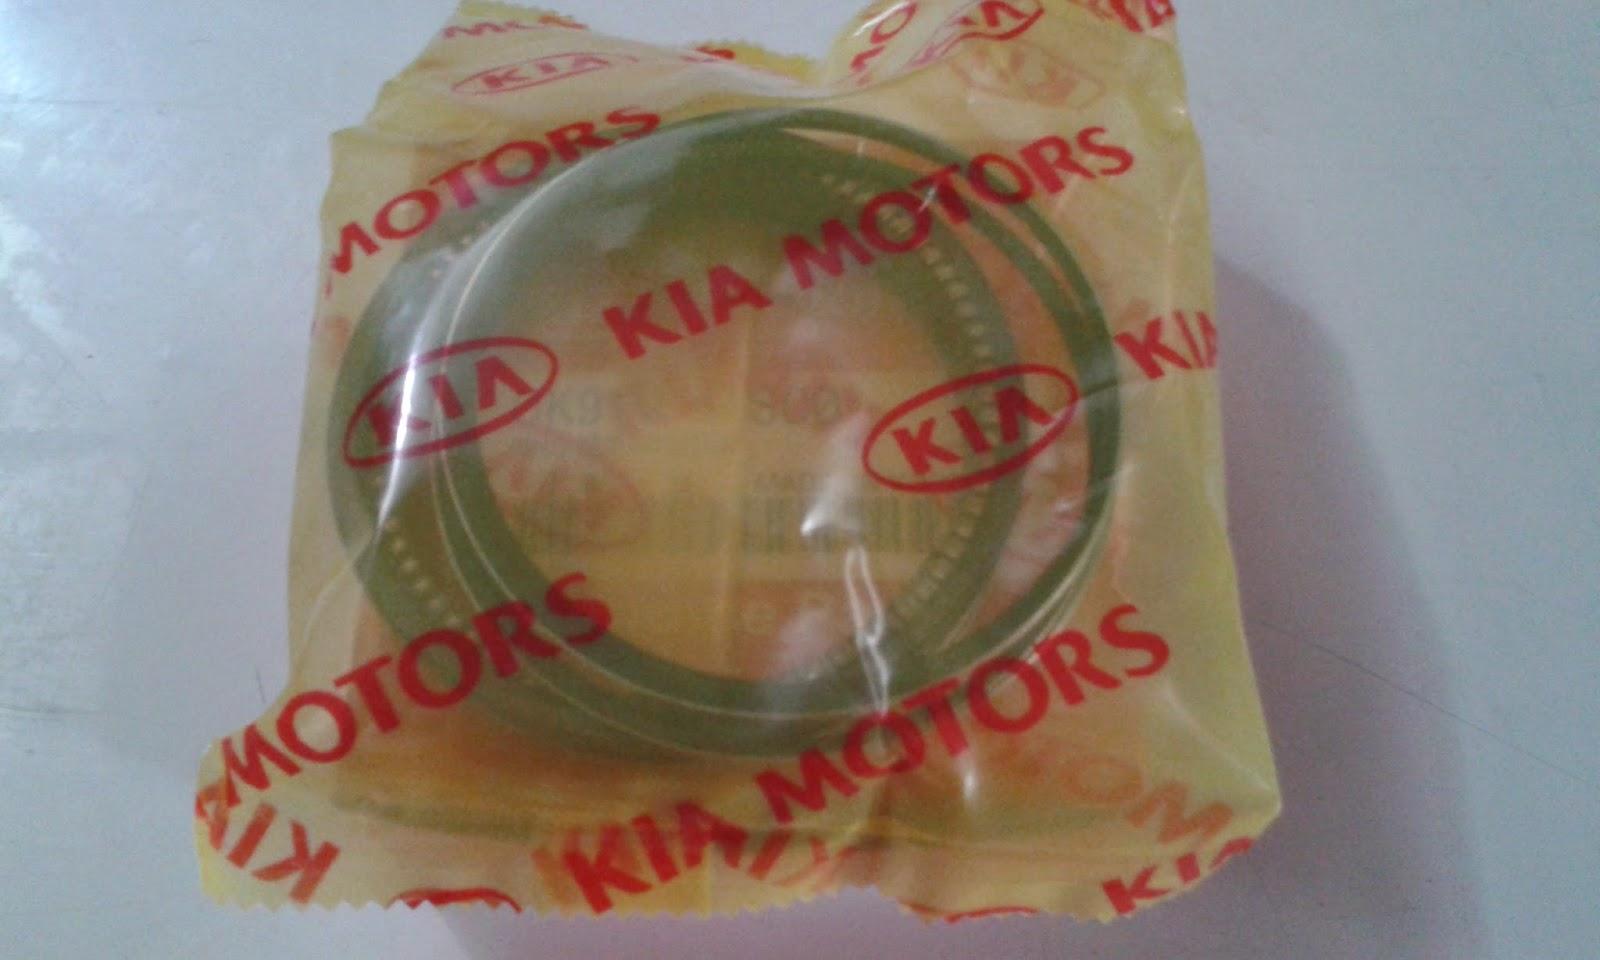 10.Ring Seher / Ring Piston Kia Carnival, Hyundai Accent, Hyundai